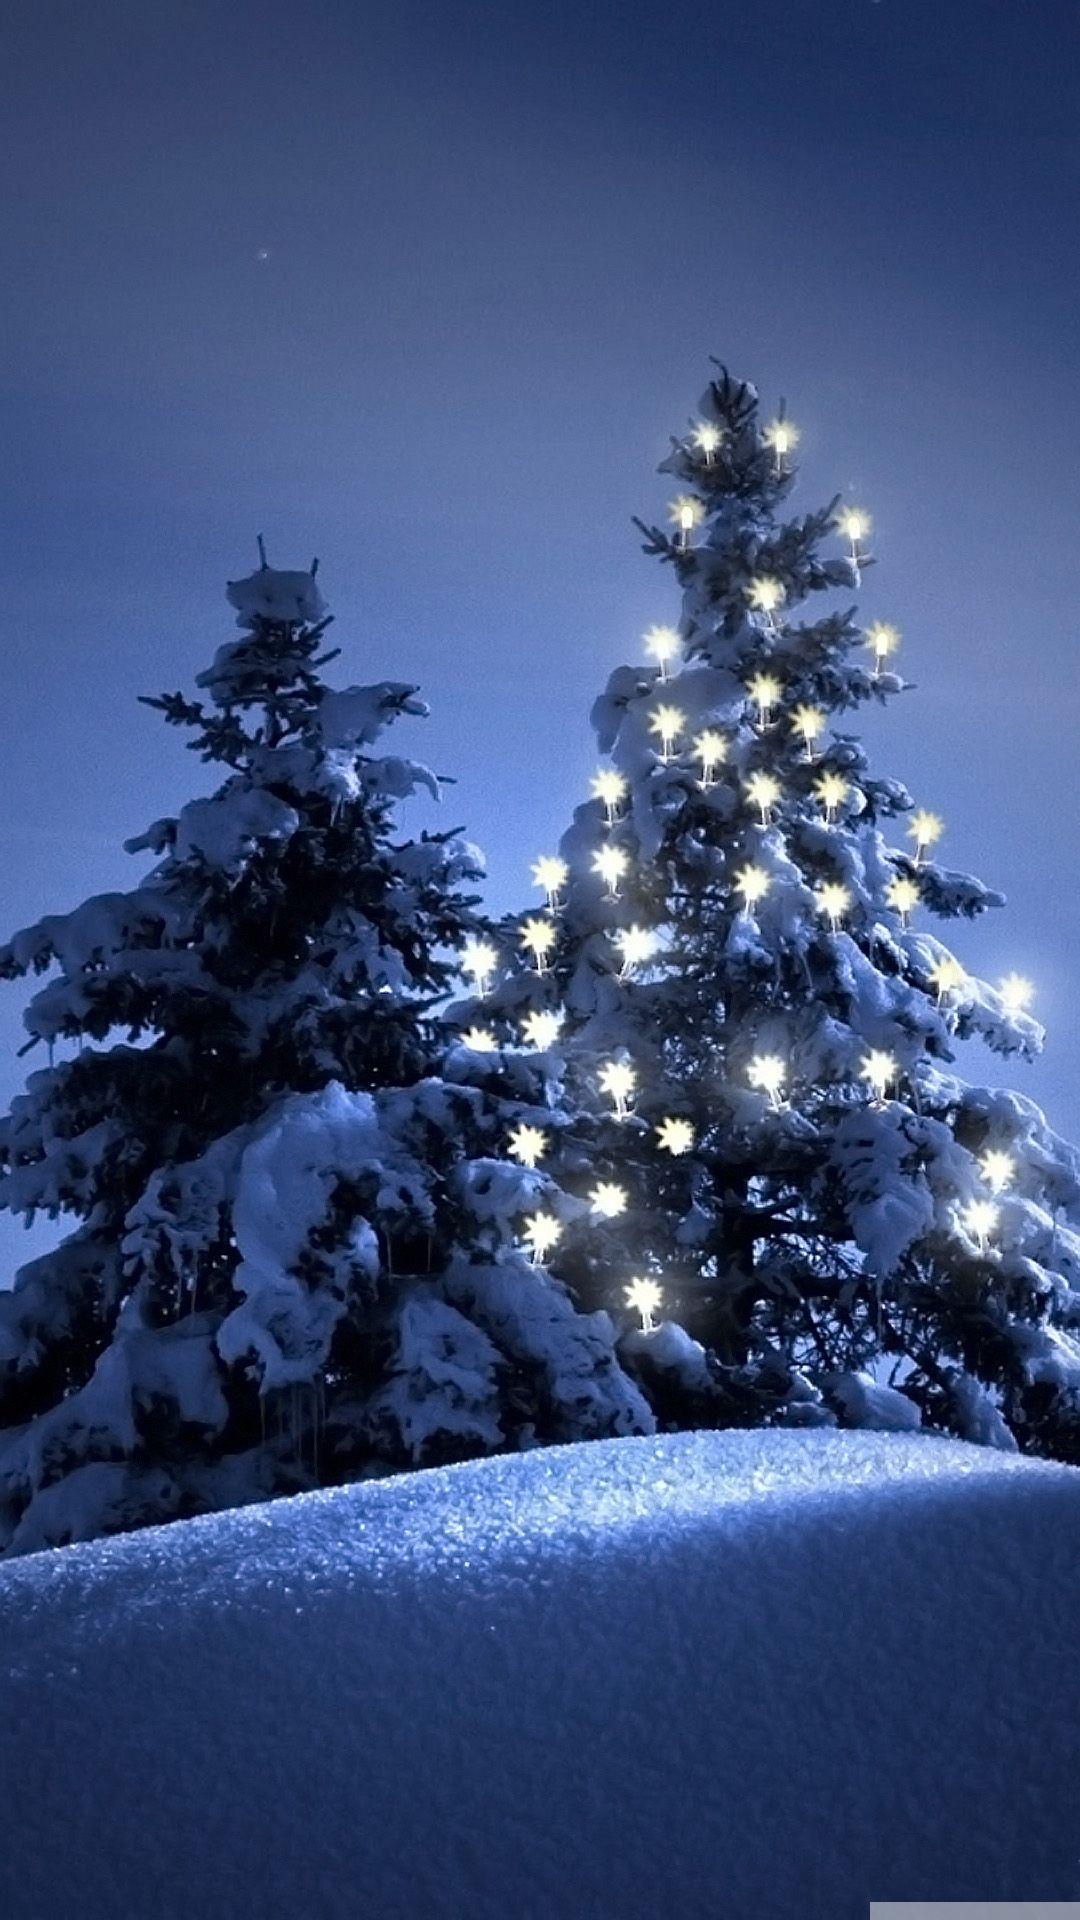 Snow christmas tree winter iPhone 6 wallpaper 1080x1920